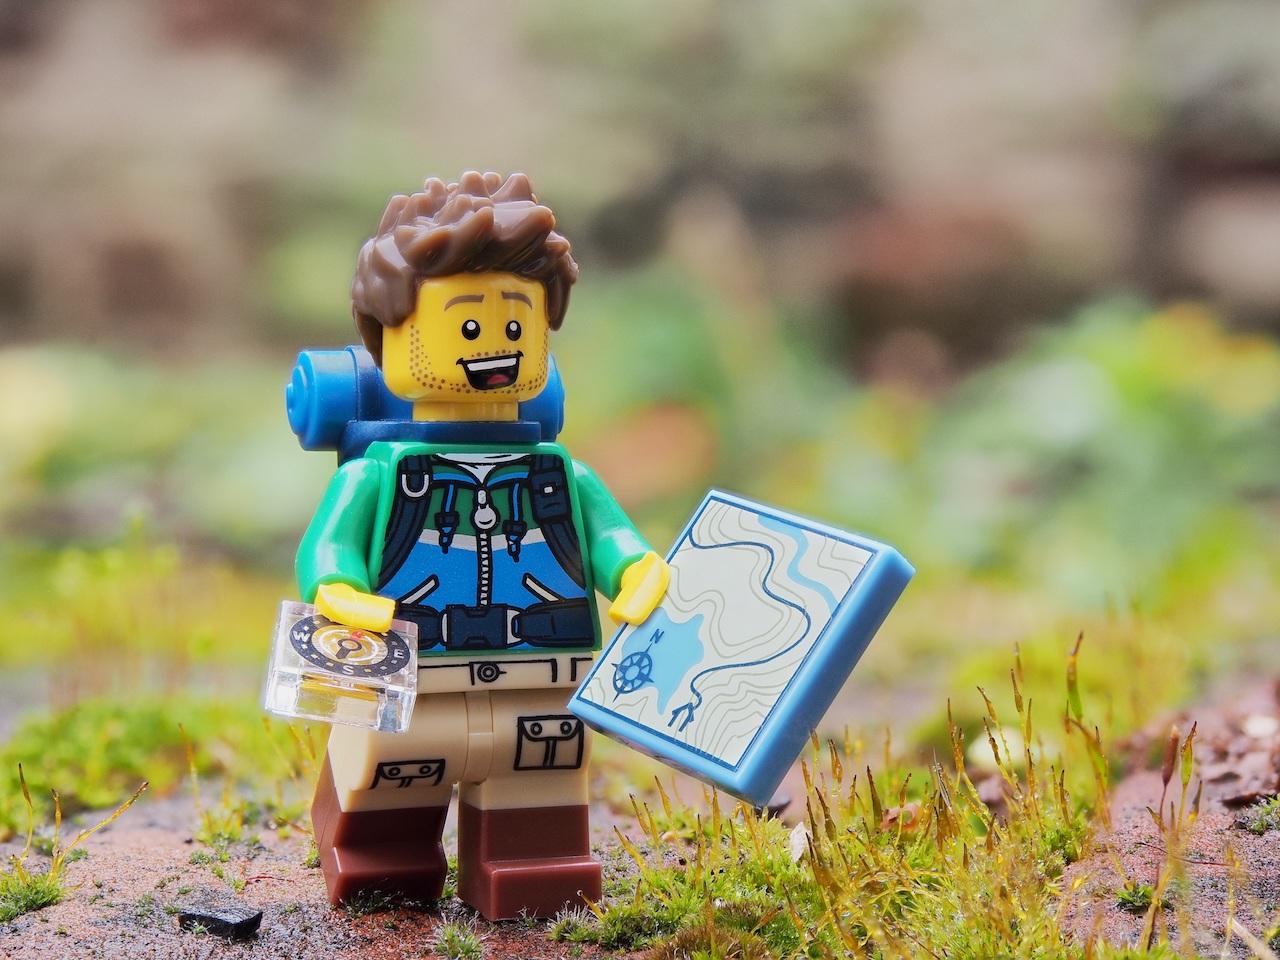 Lego man orienteering